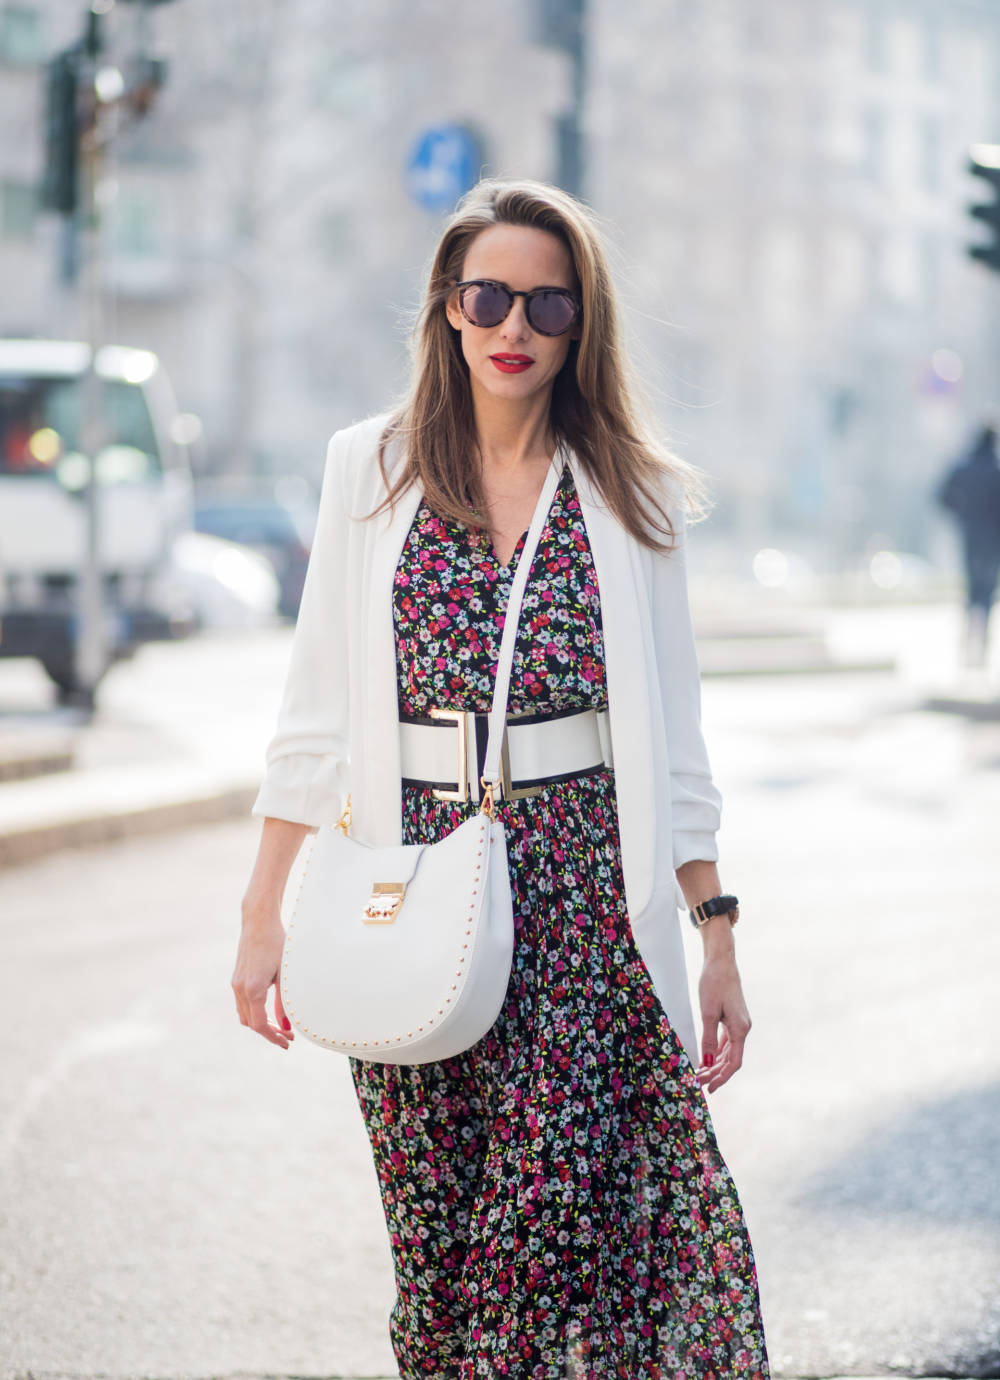 Bloggerin Alexandra Lapp